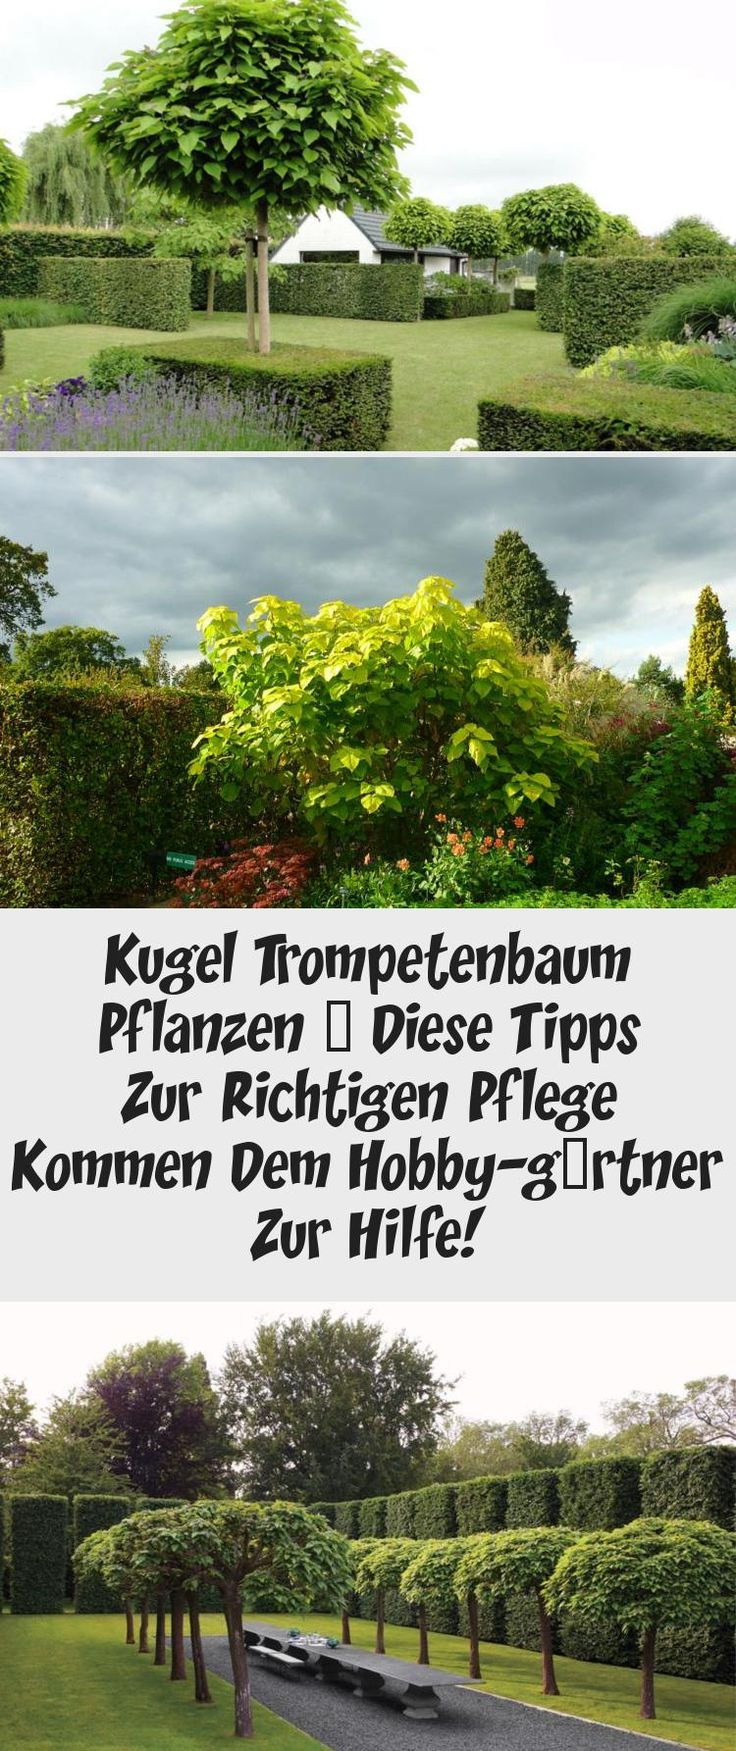 Hobby-Gärtner Nostalgieschild